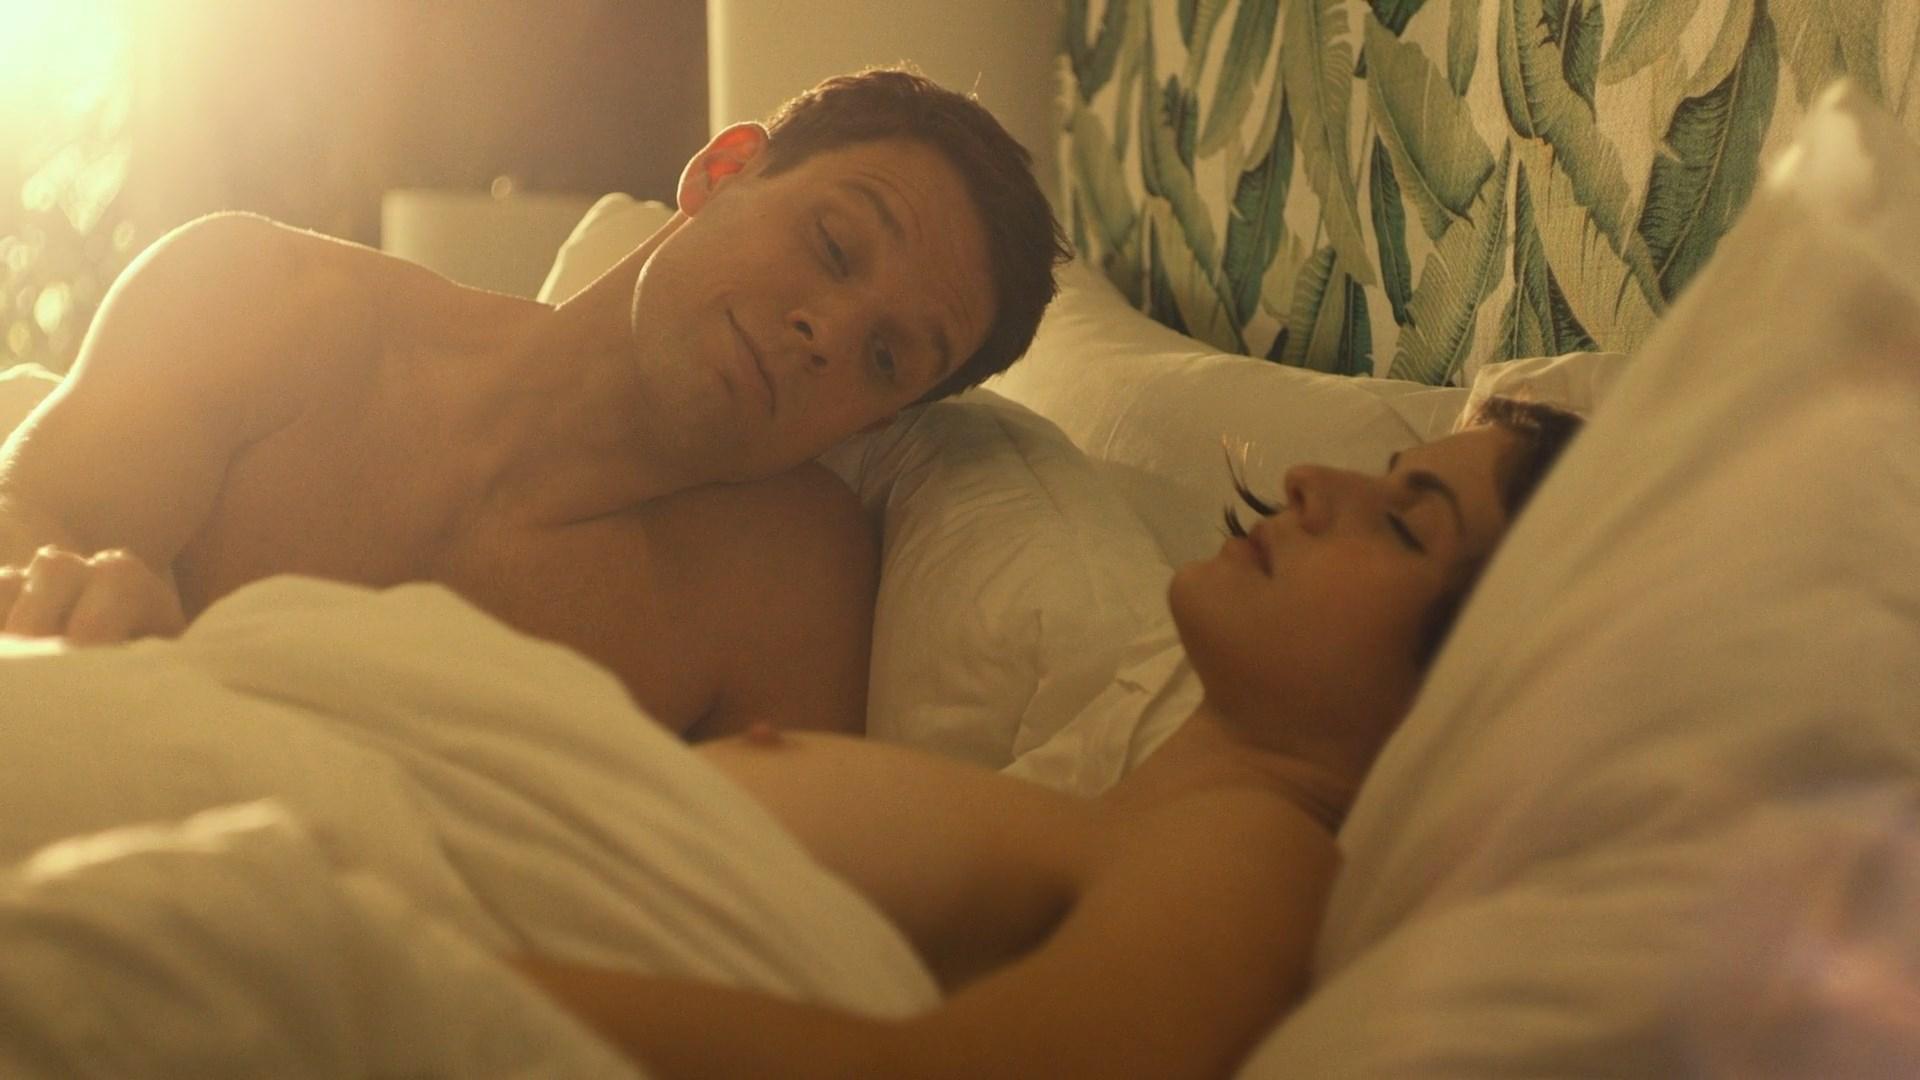 Alexandra Daddario - Сериал Белый лотос, 2 серия.mkv_snapshot_00.05_[2021.07.20_01.02.59].jpg